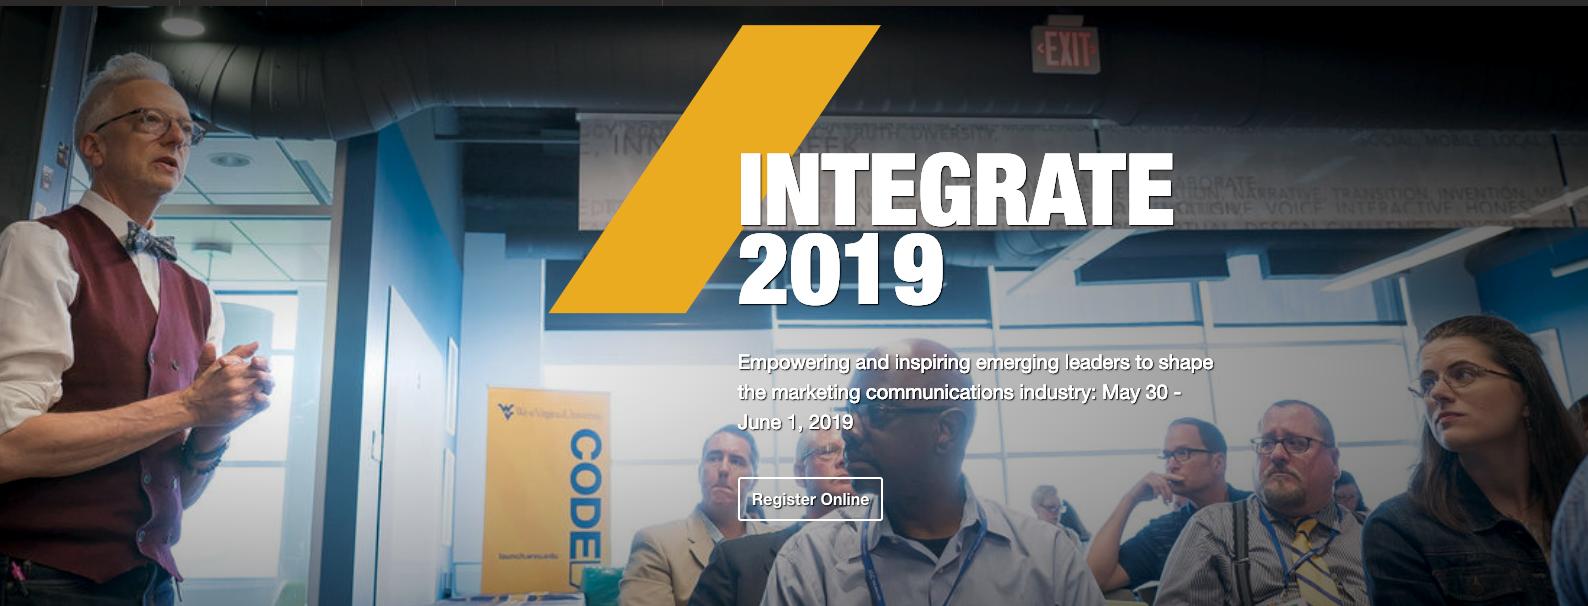 integrate-2019